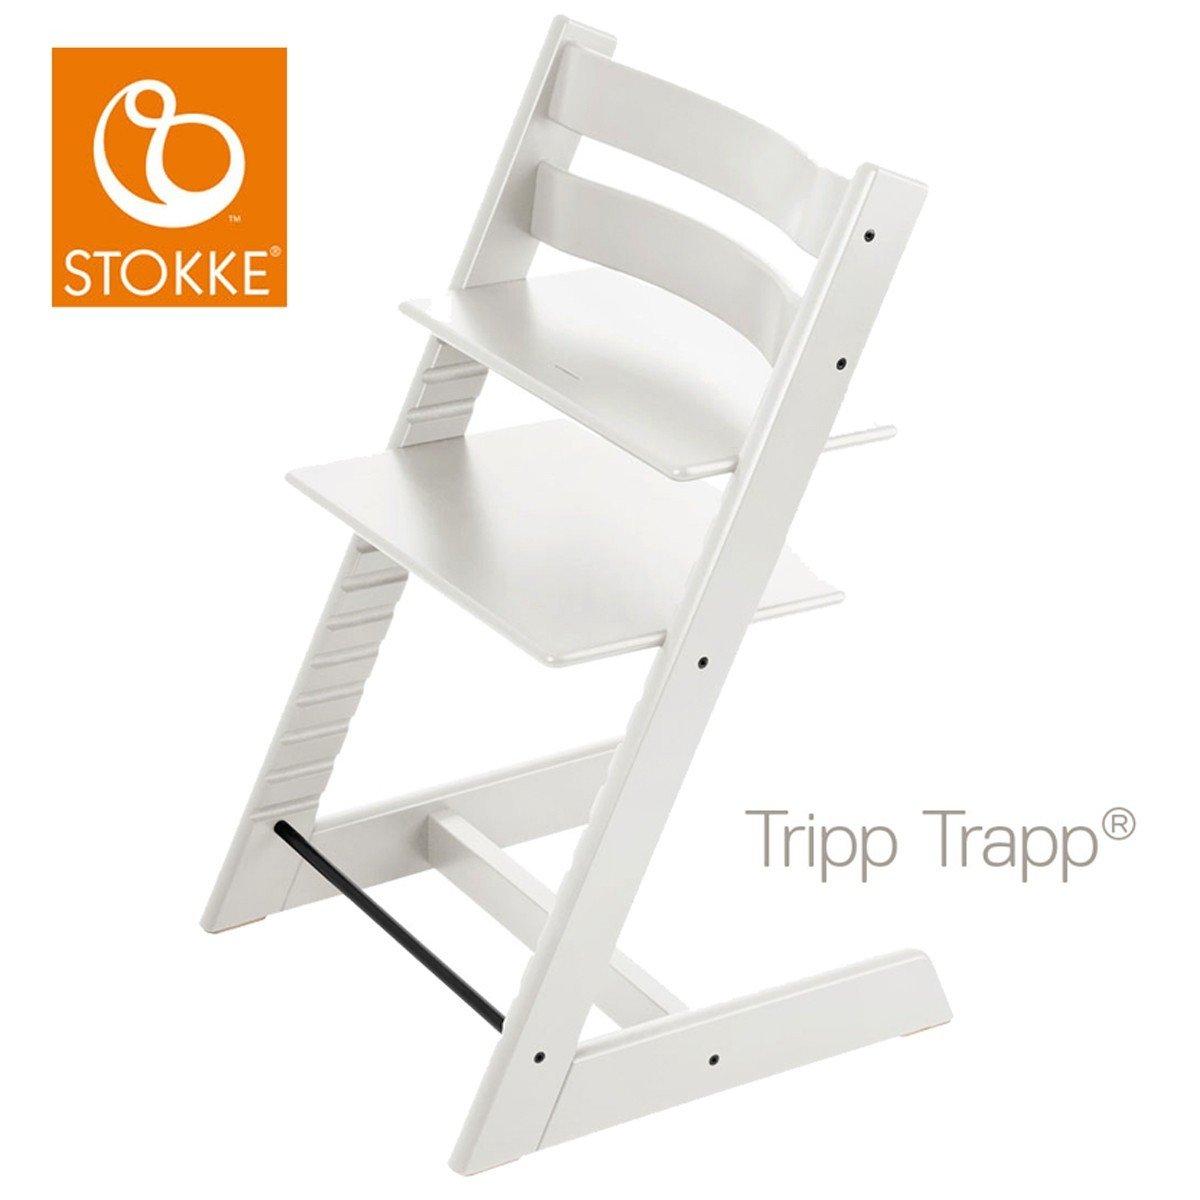 Stokke Tripp Trapp - @ Natural: Amazon.co.uk: Baby